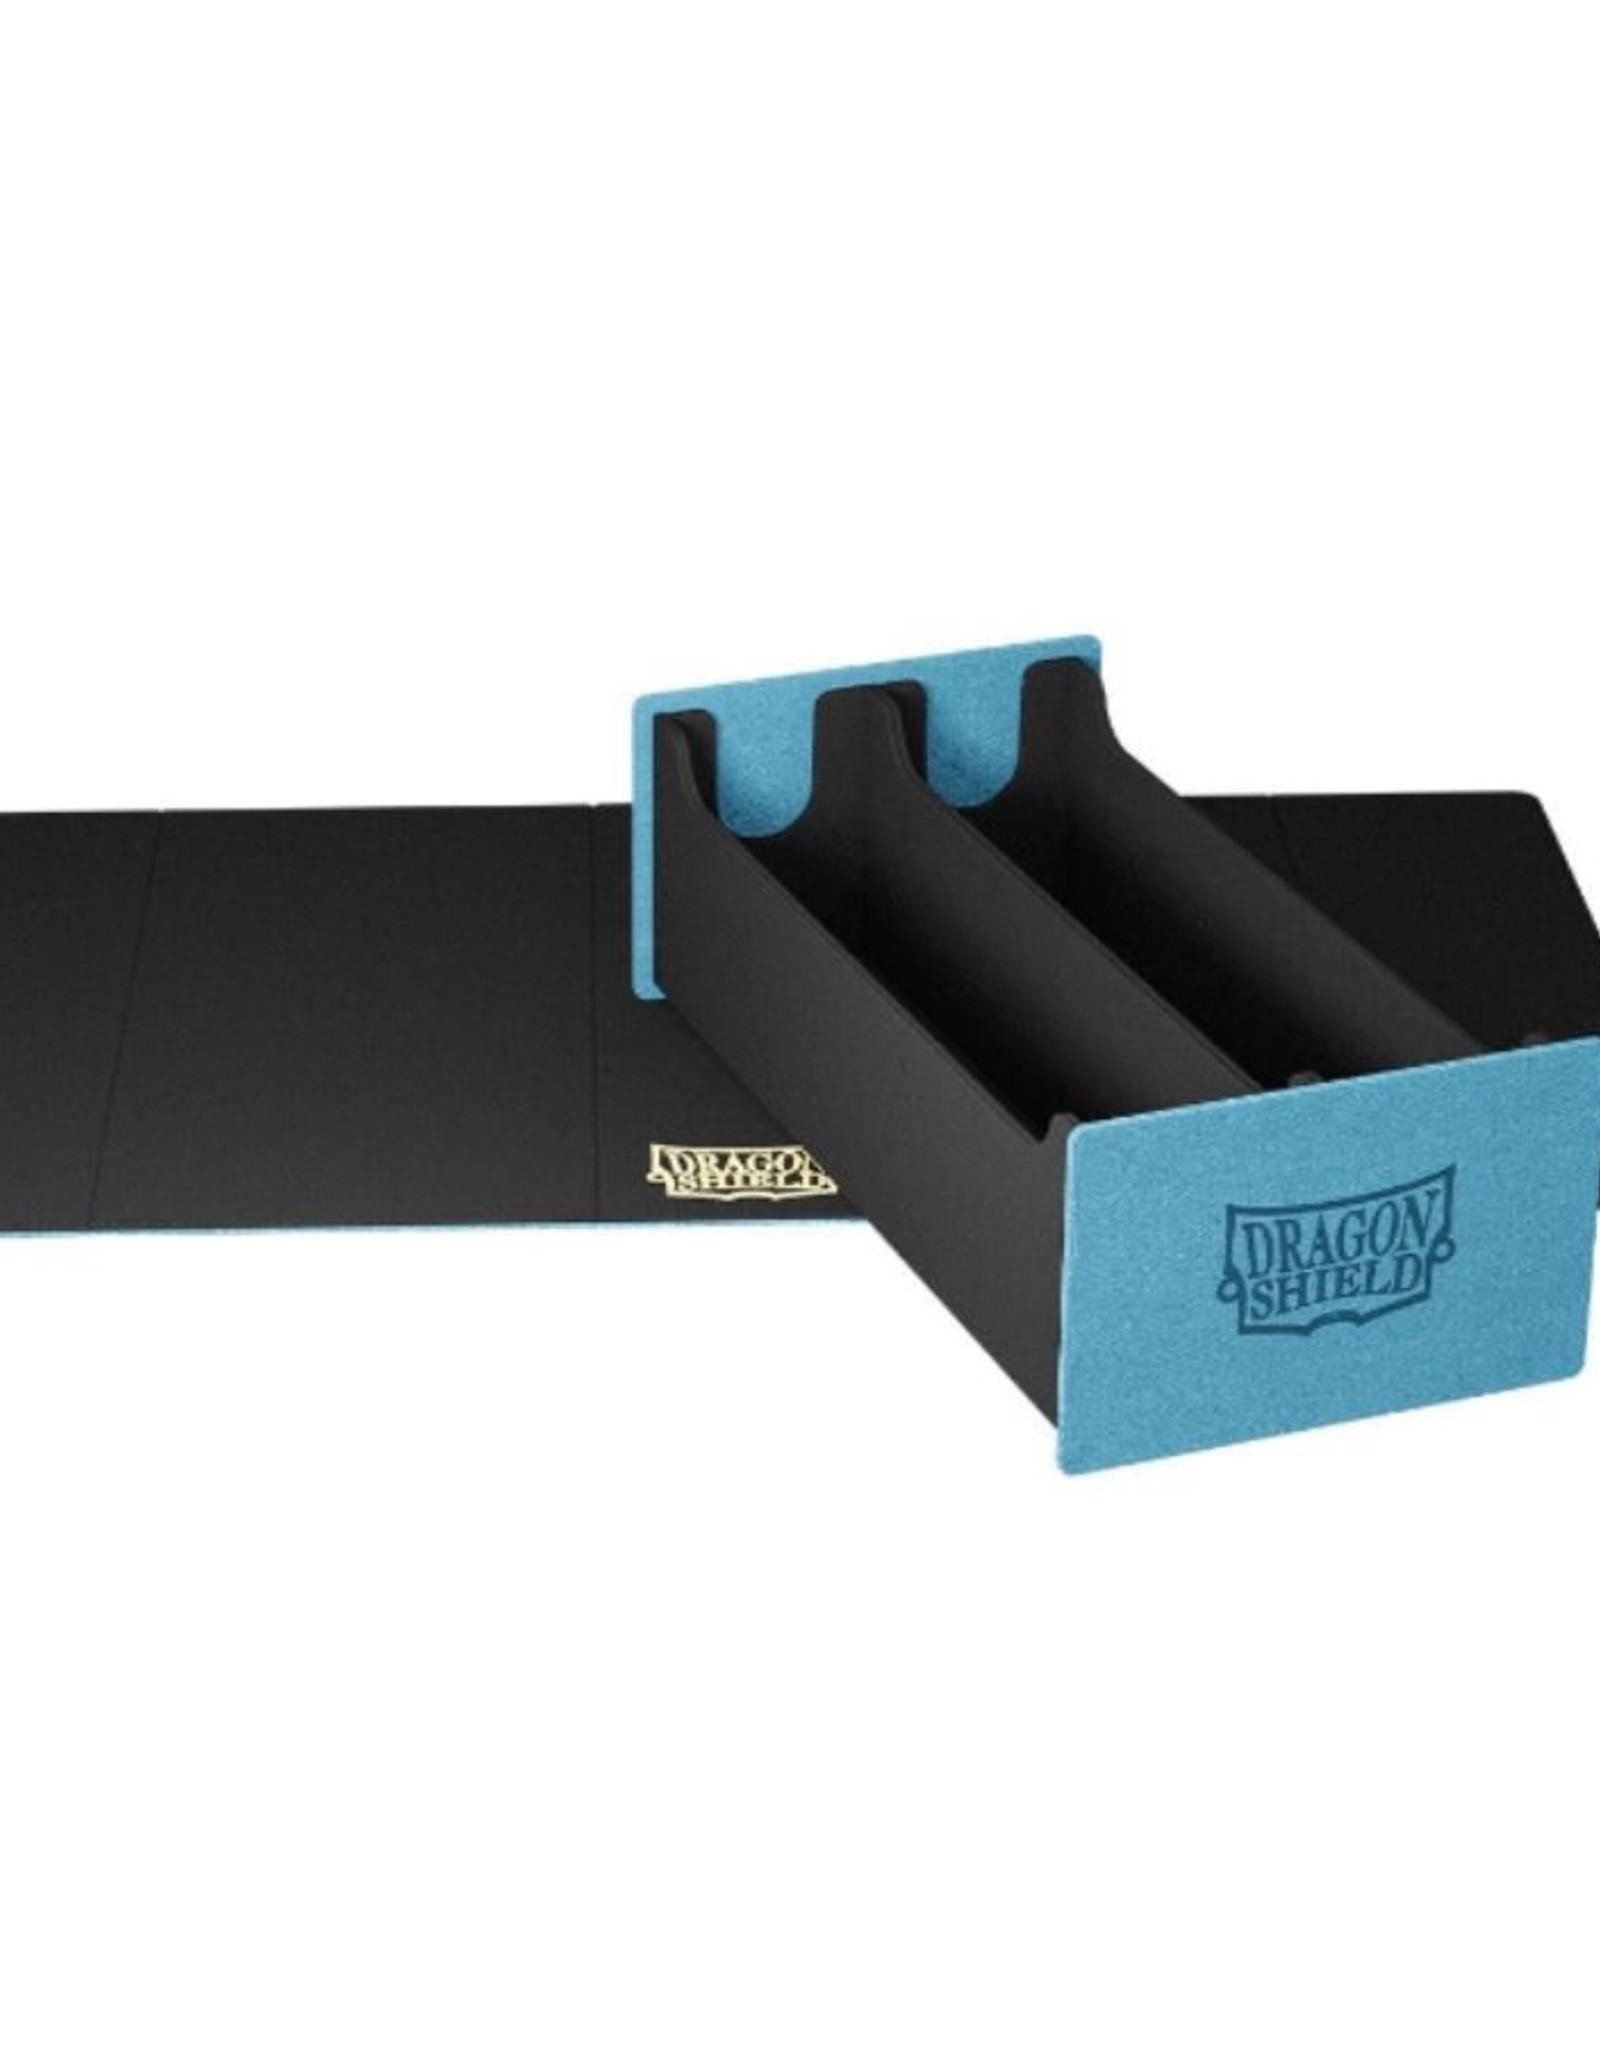 Arcane Tinmen Dragon Shield NEST Magic Carpet XL Blue/Blk